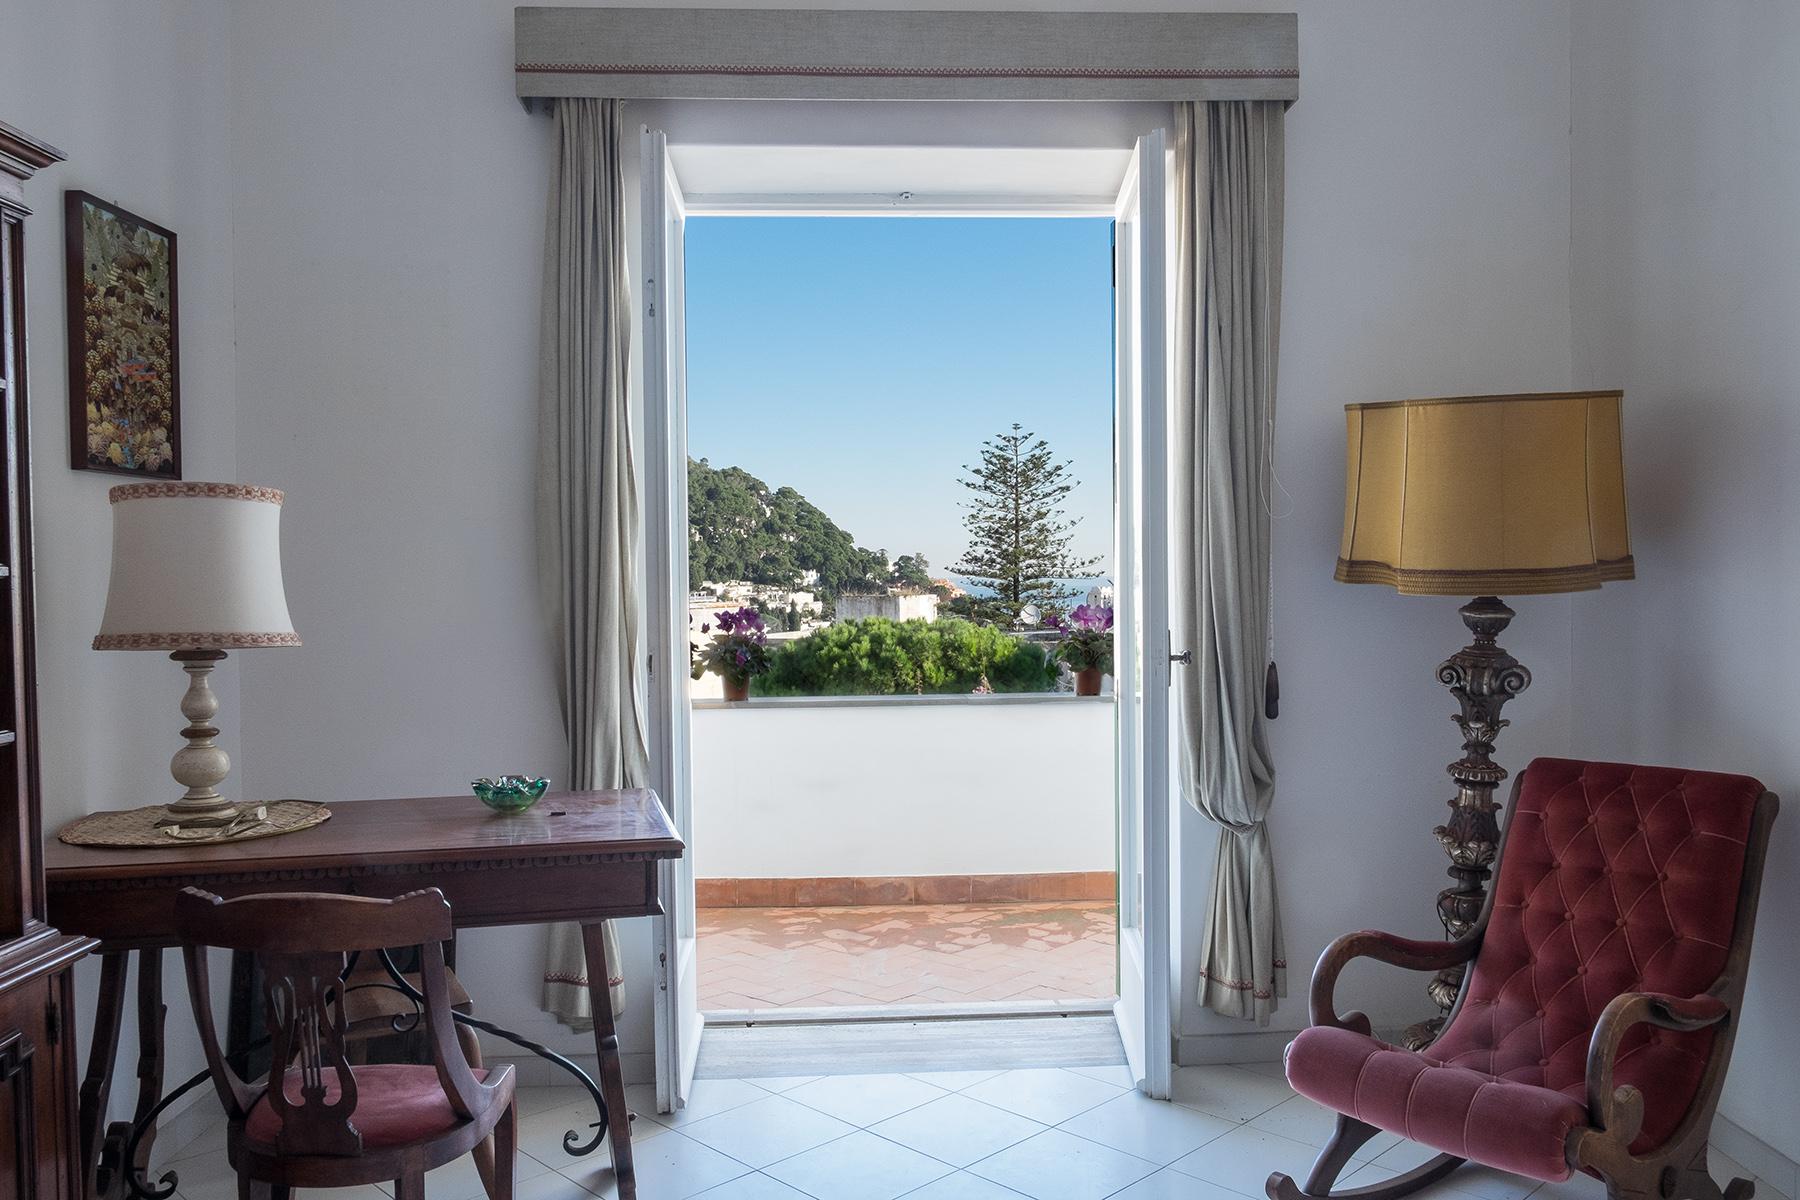 Casa indipendente in Vendita a Capri: 5 locali, 400 mq - Foto 13